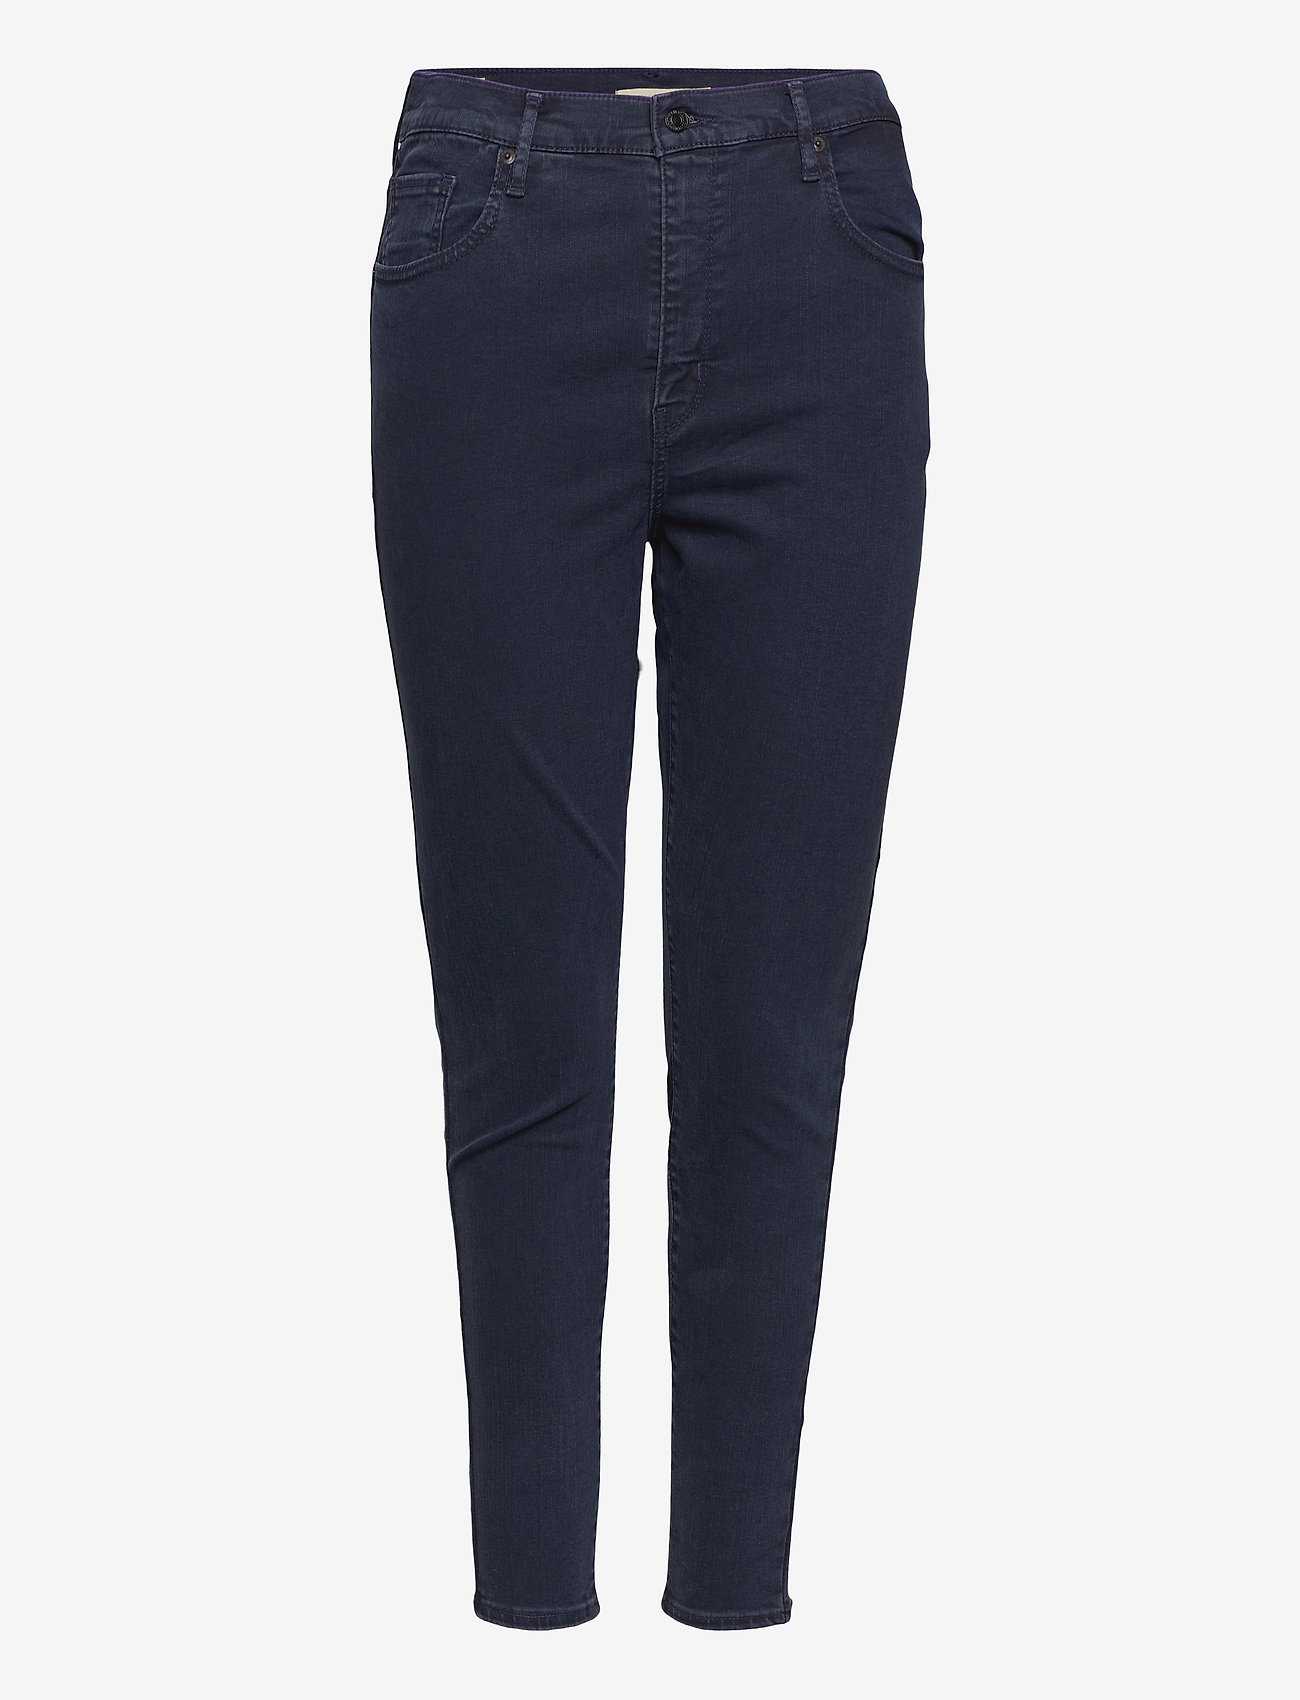 Levi's Plus Size - PLUS MILE HIGH SS BRUISED HEAR - skinny jeans - blacks - 0